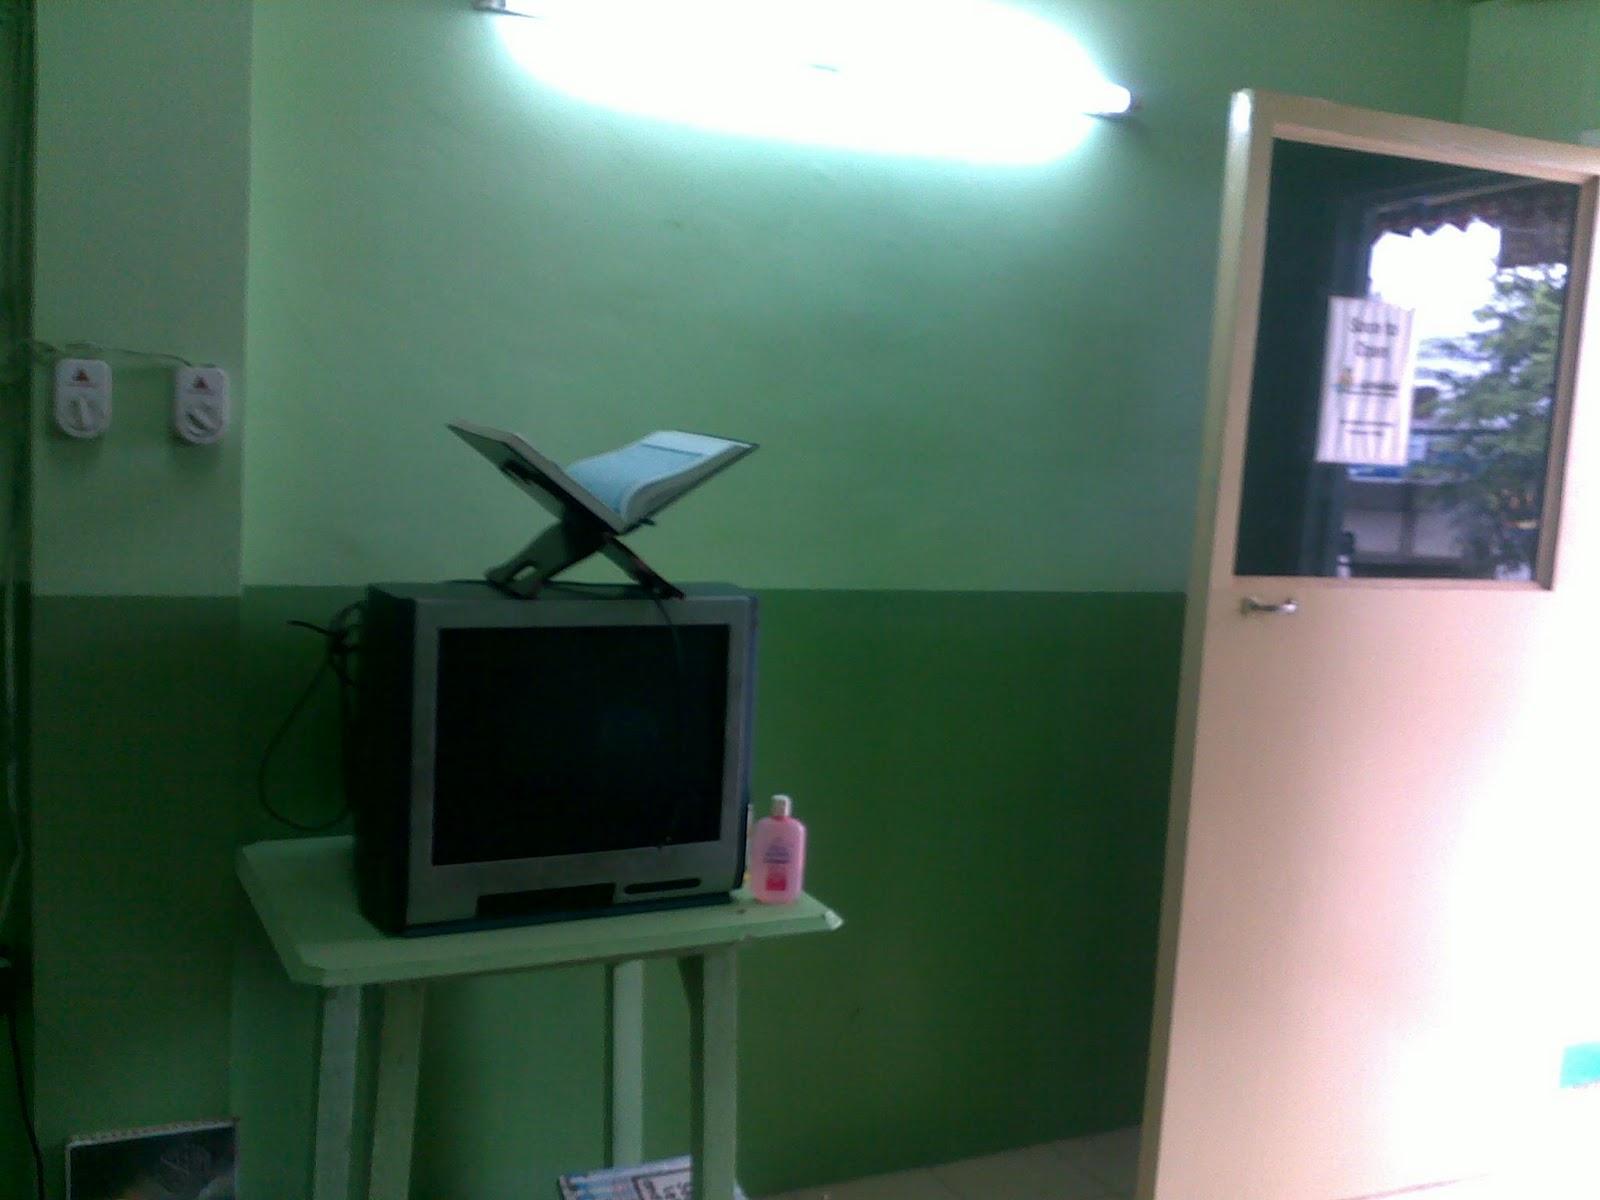 Moro Bloggers Central Aggregator Part 377 Hobby Hound Diy Electronics Projects2 Assalamu Alaikum Wa Rahmatullahi Barakatuh